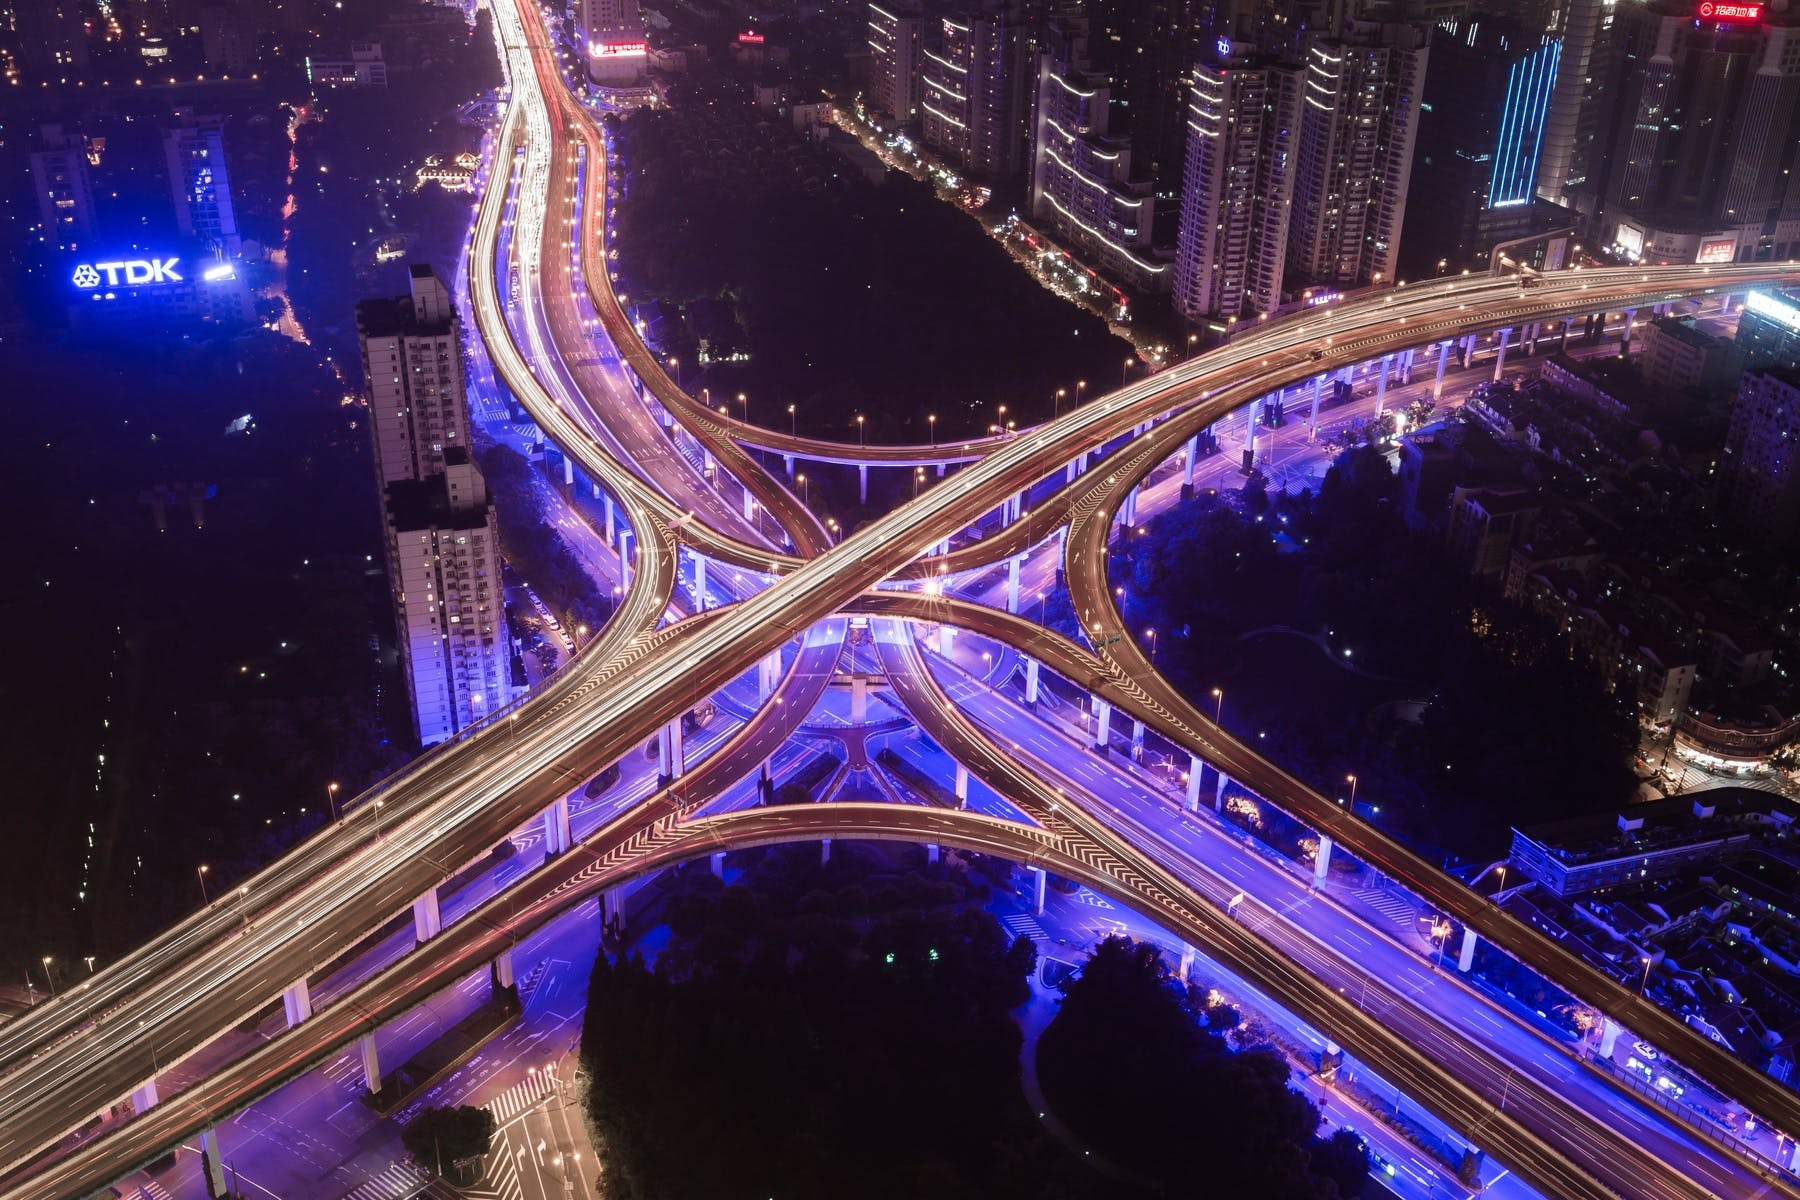 bridge-night-city-cityscape-freeway-light-trail-157189-pxhere.com.jpg